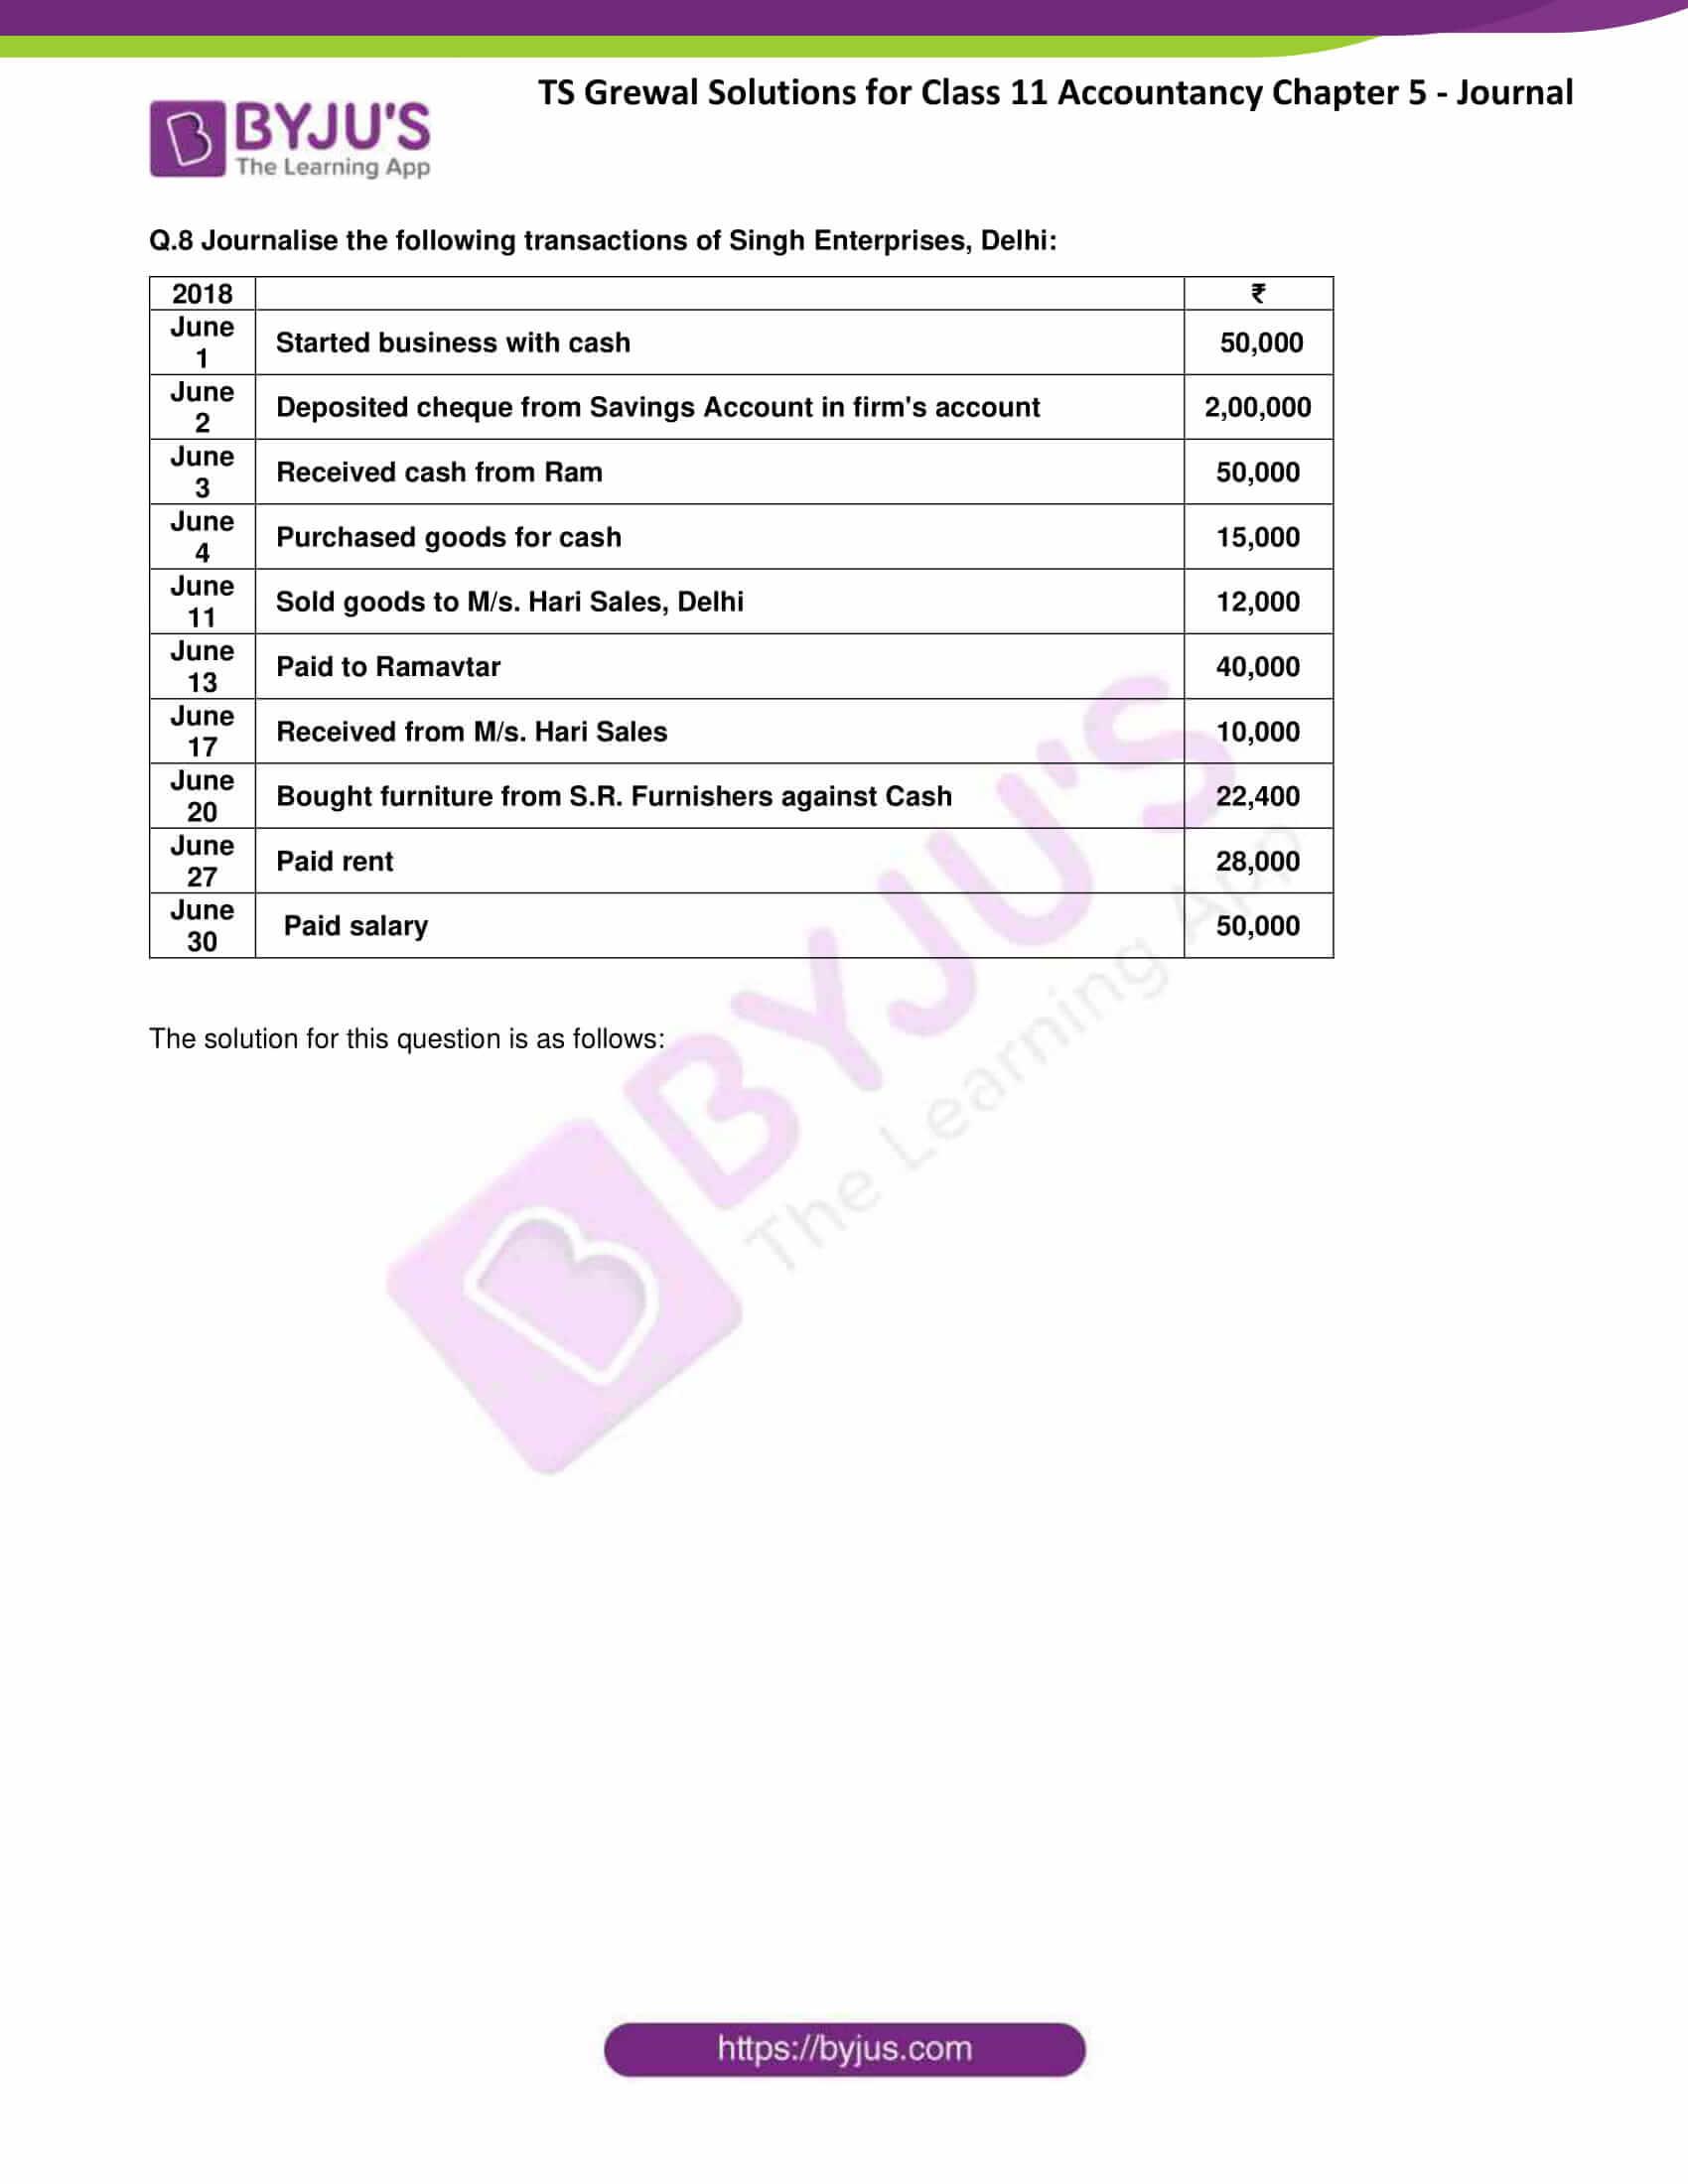 ts grewal class 11 accountancy chapter 5 journal 13